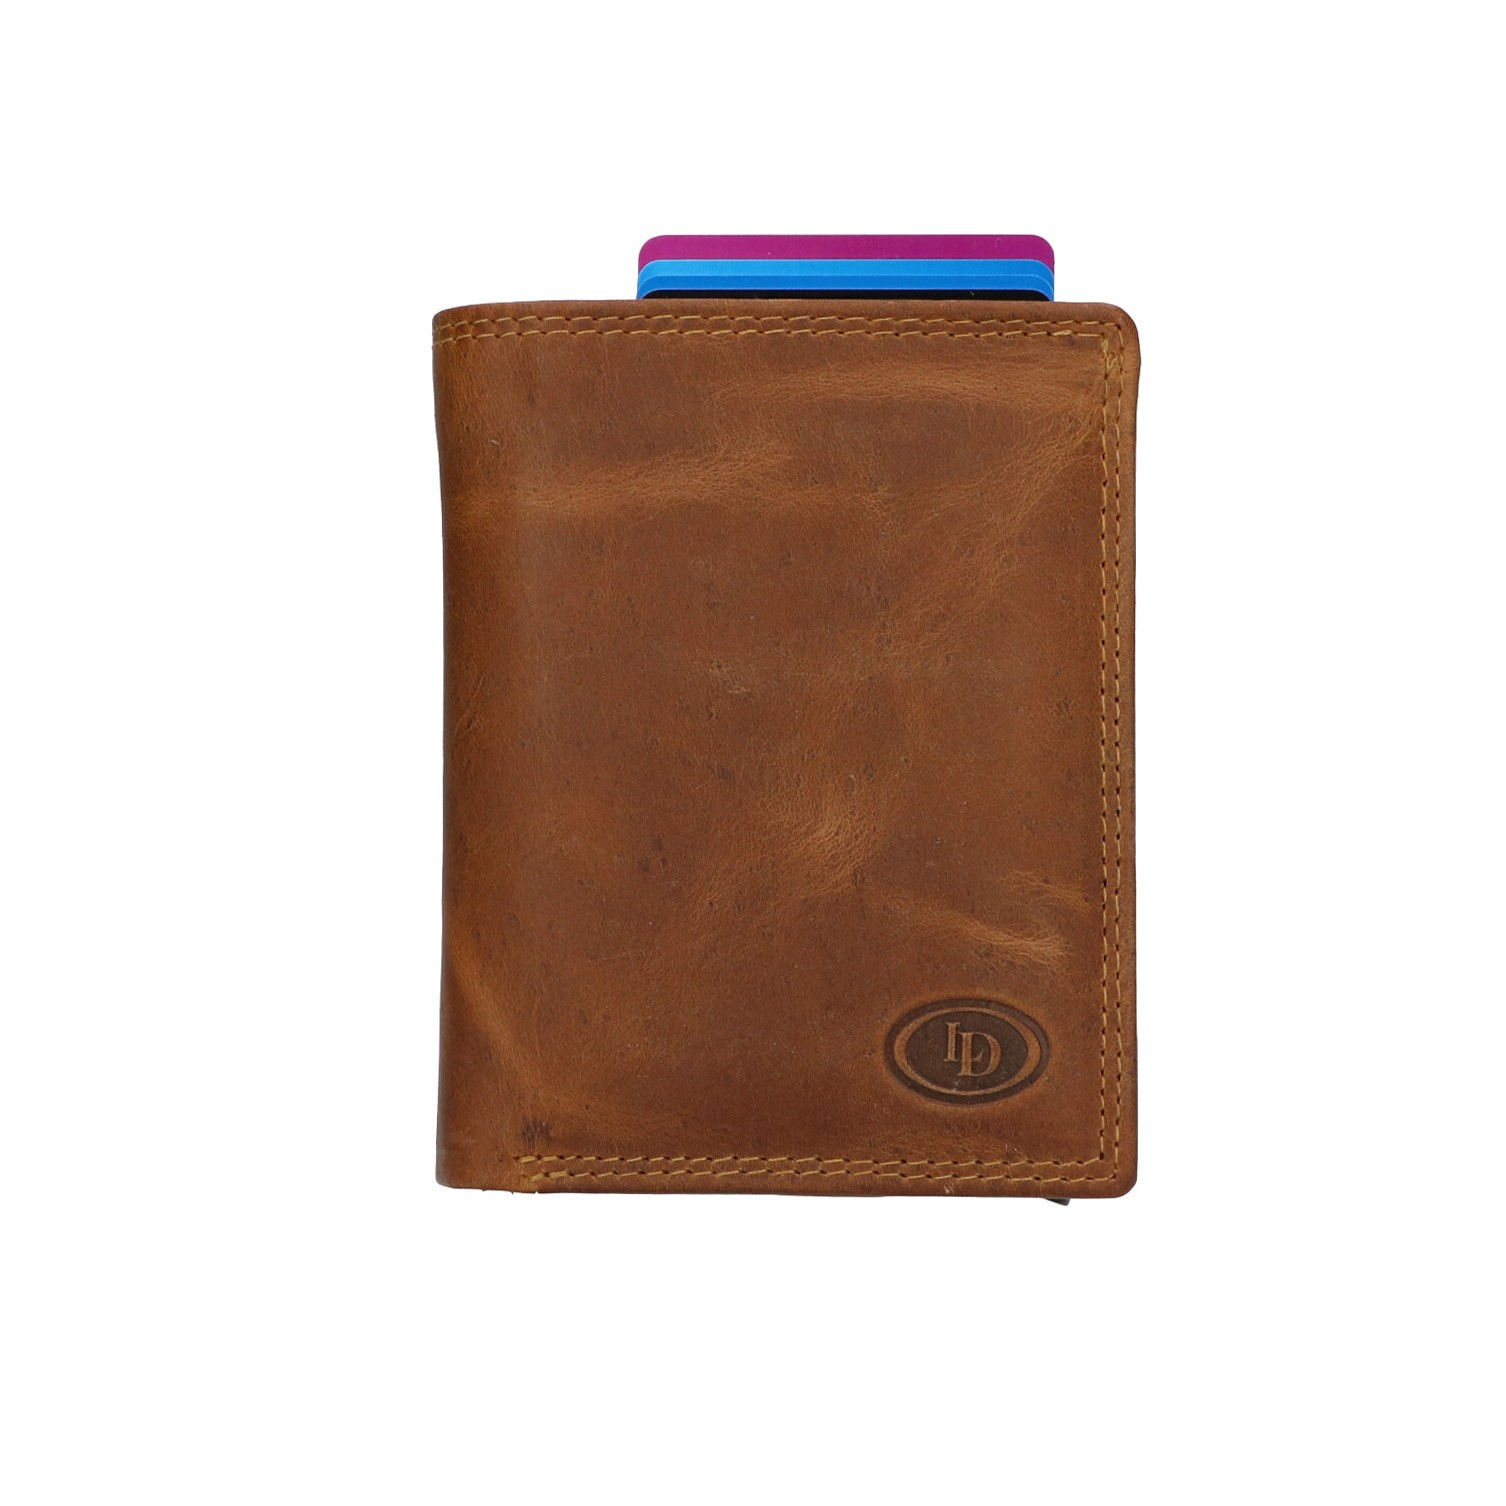 Leather Design Billfold HU 2723 Bruin